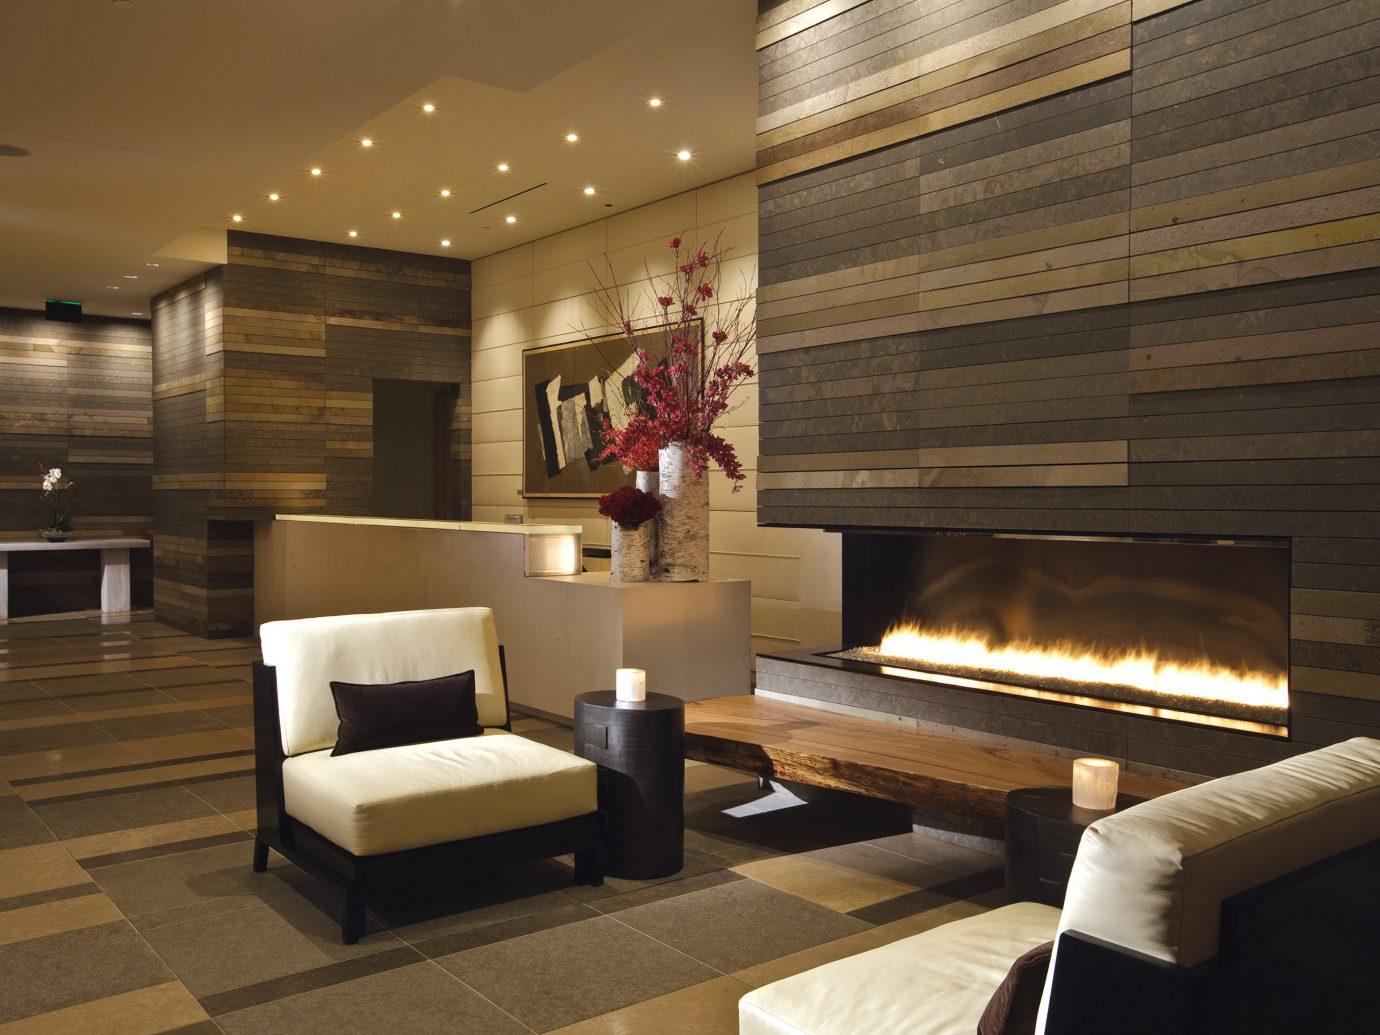 Elegant Fireplace Hotels Living Lounge Modern indoor floor room ceiling Lobby living room interior design estate lighting Design home wood furniture window covering